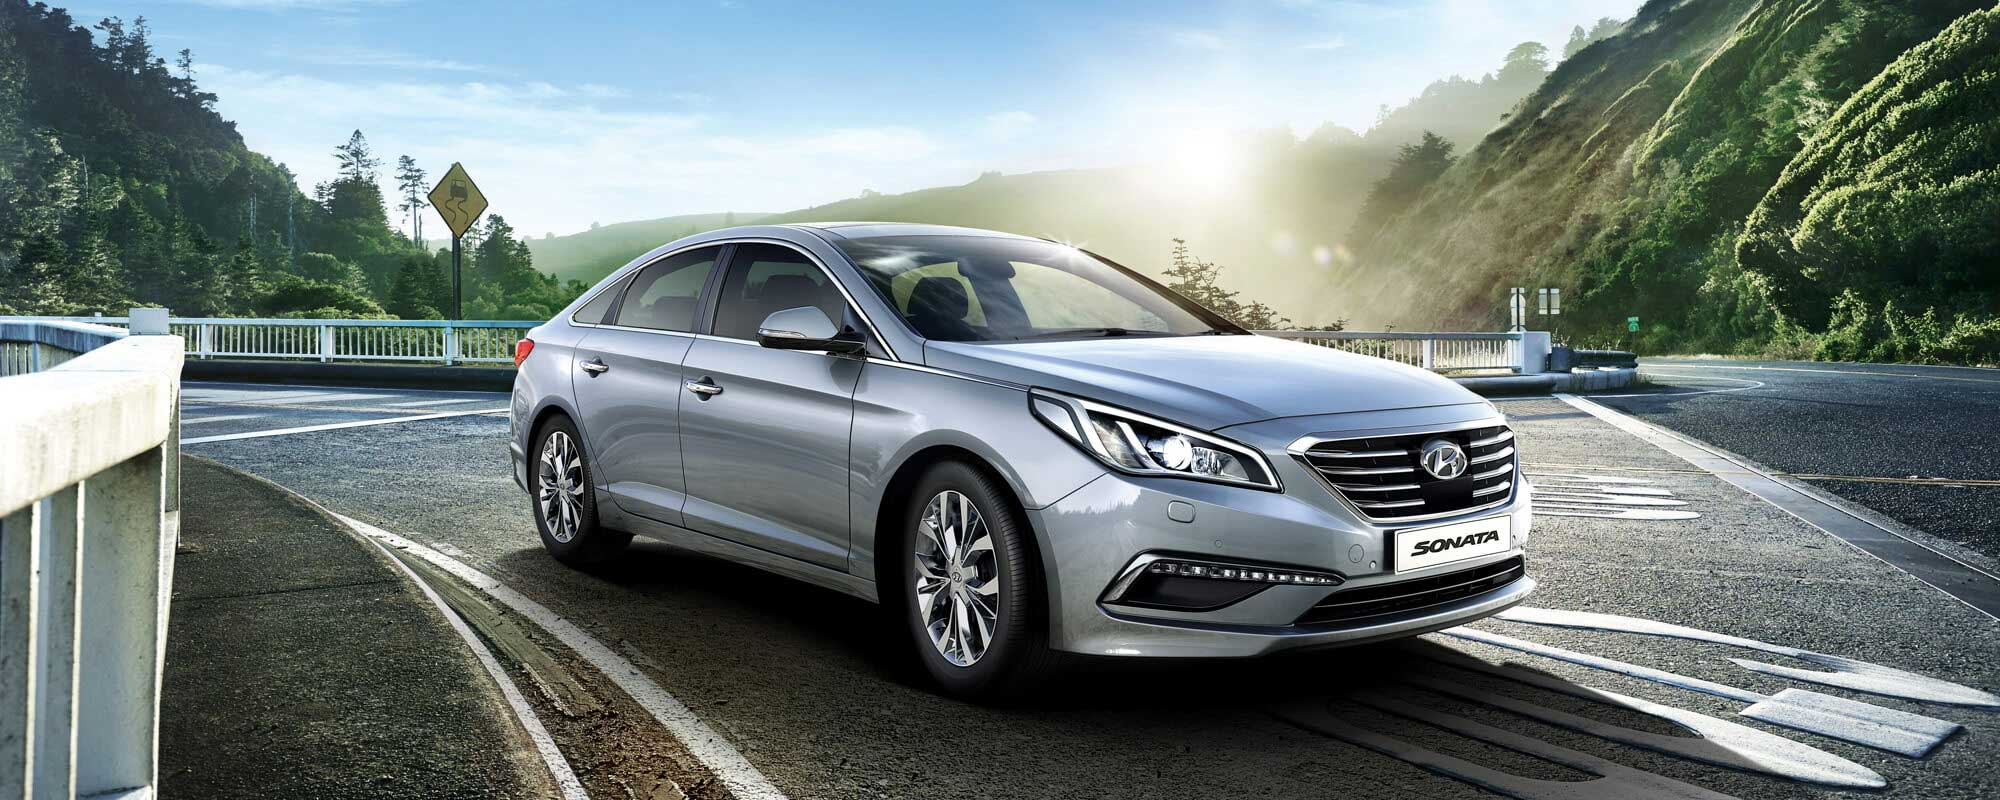 All-new Hyundai Sonata sedan, find out more at Metro Hyundai in Brisbane.